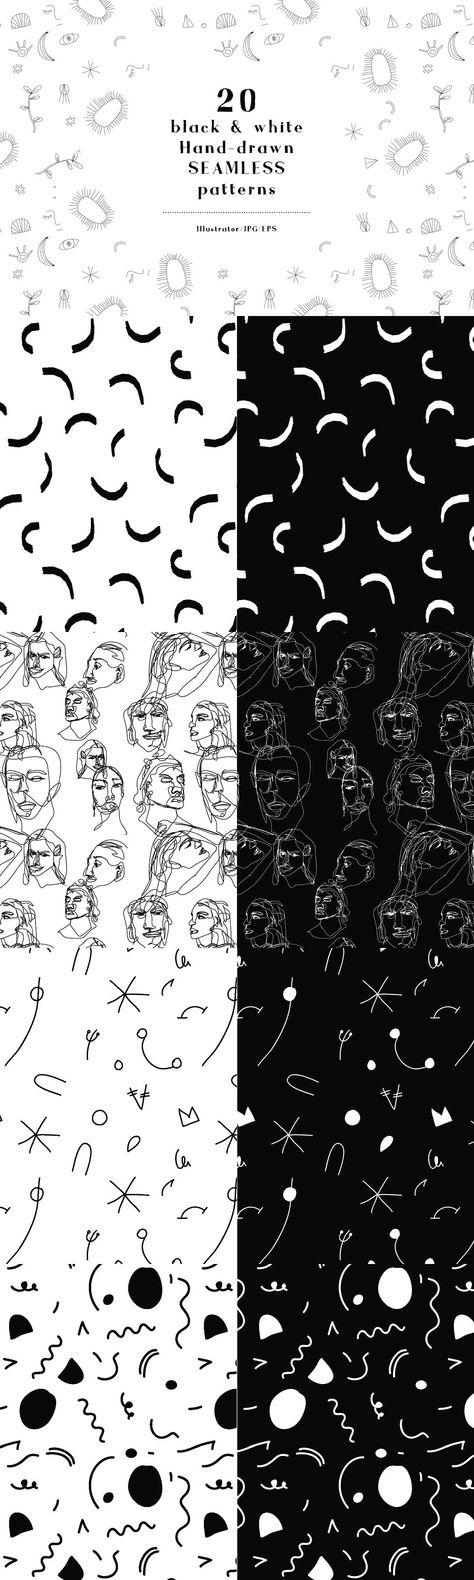 20 B&W hand drawn SEAMLESS PATTERNS